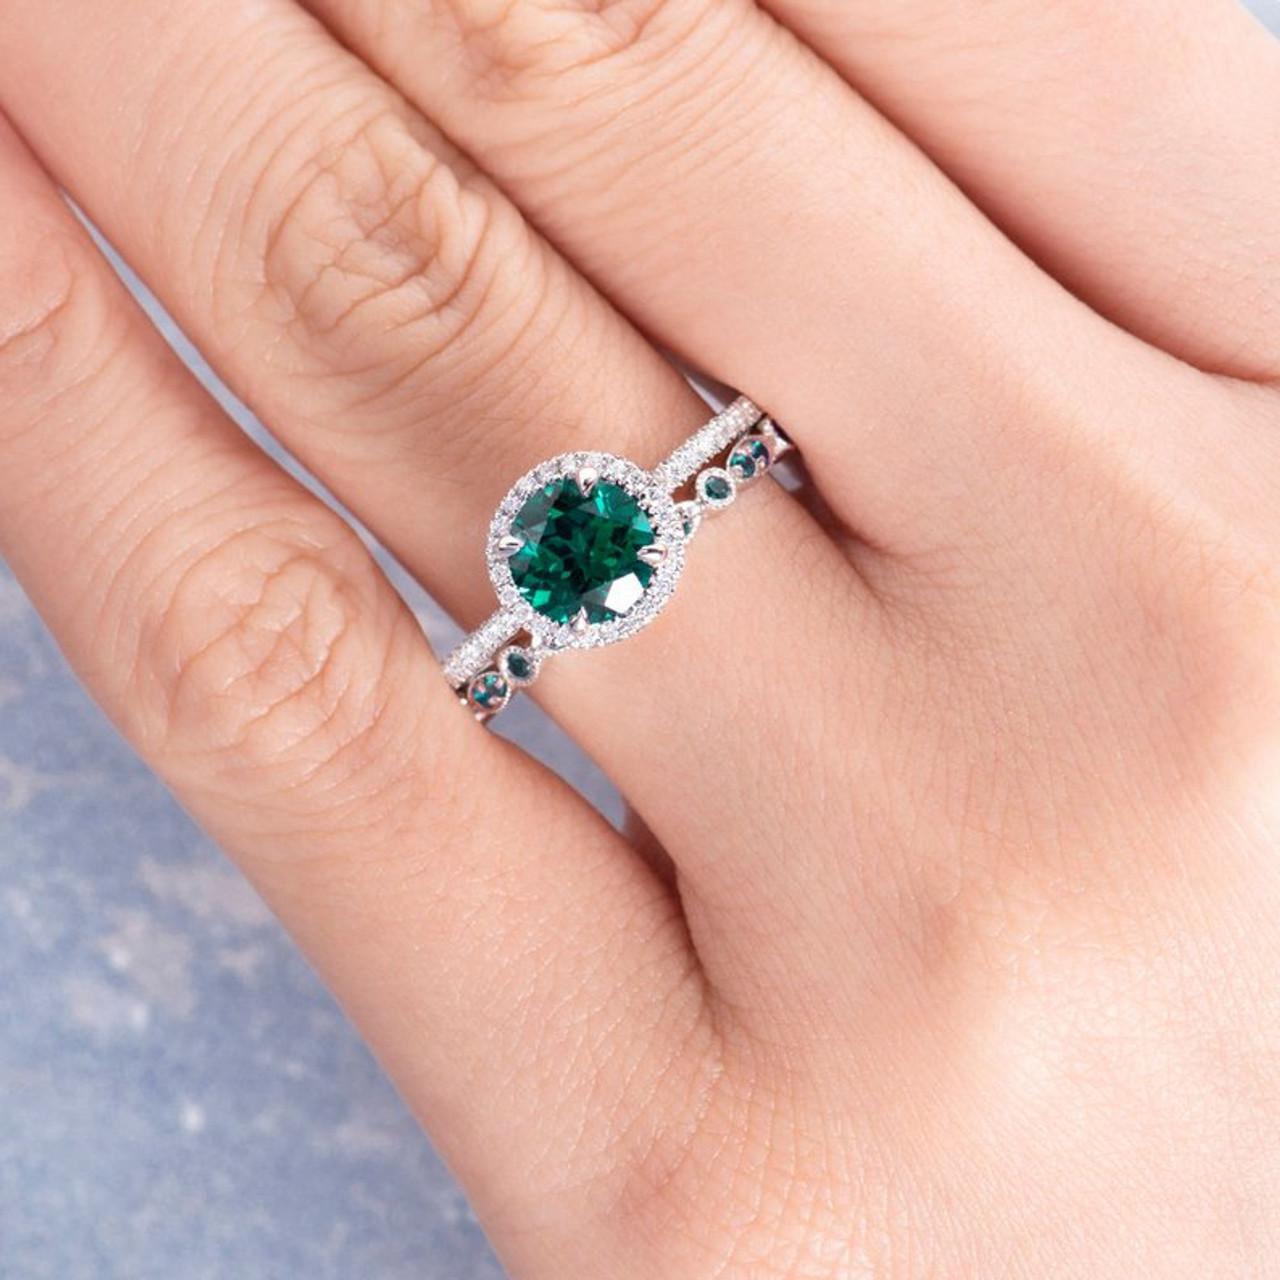 6 Best Women's Diamond Rings to Buy in 2020